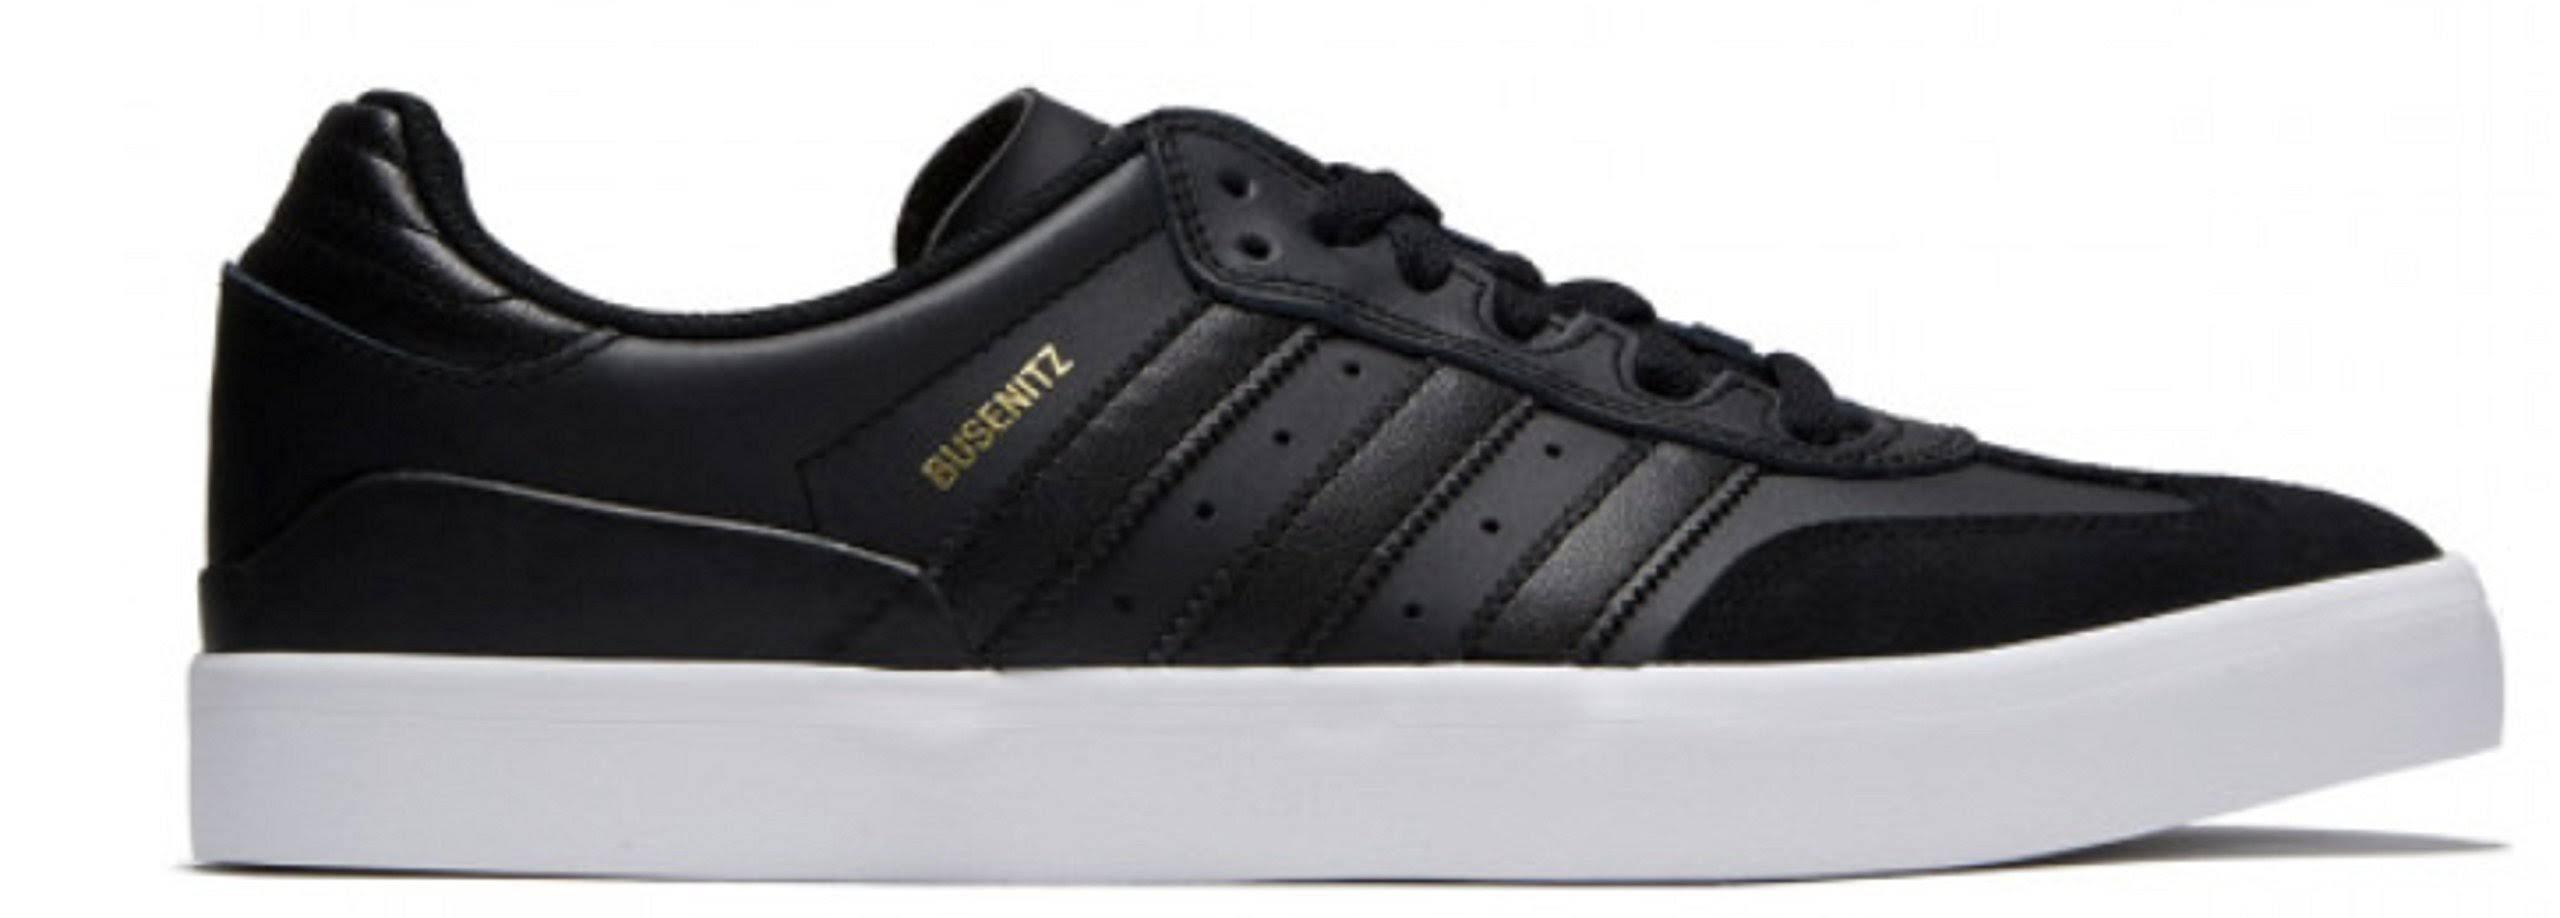 Running Negro Hombre Fashion Originals White Core Vulc Adidas Adv Para Busenitz Zapatillas xAqFwCfvHp